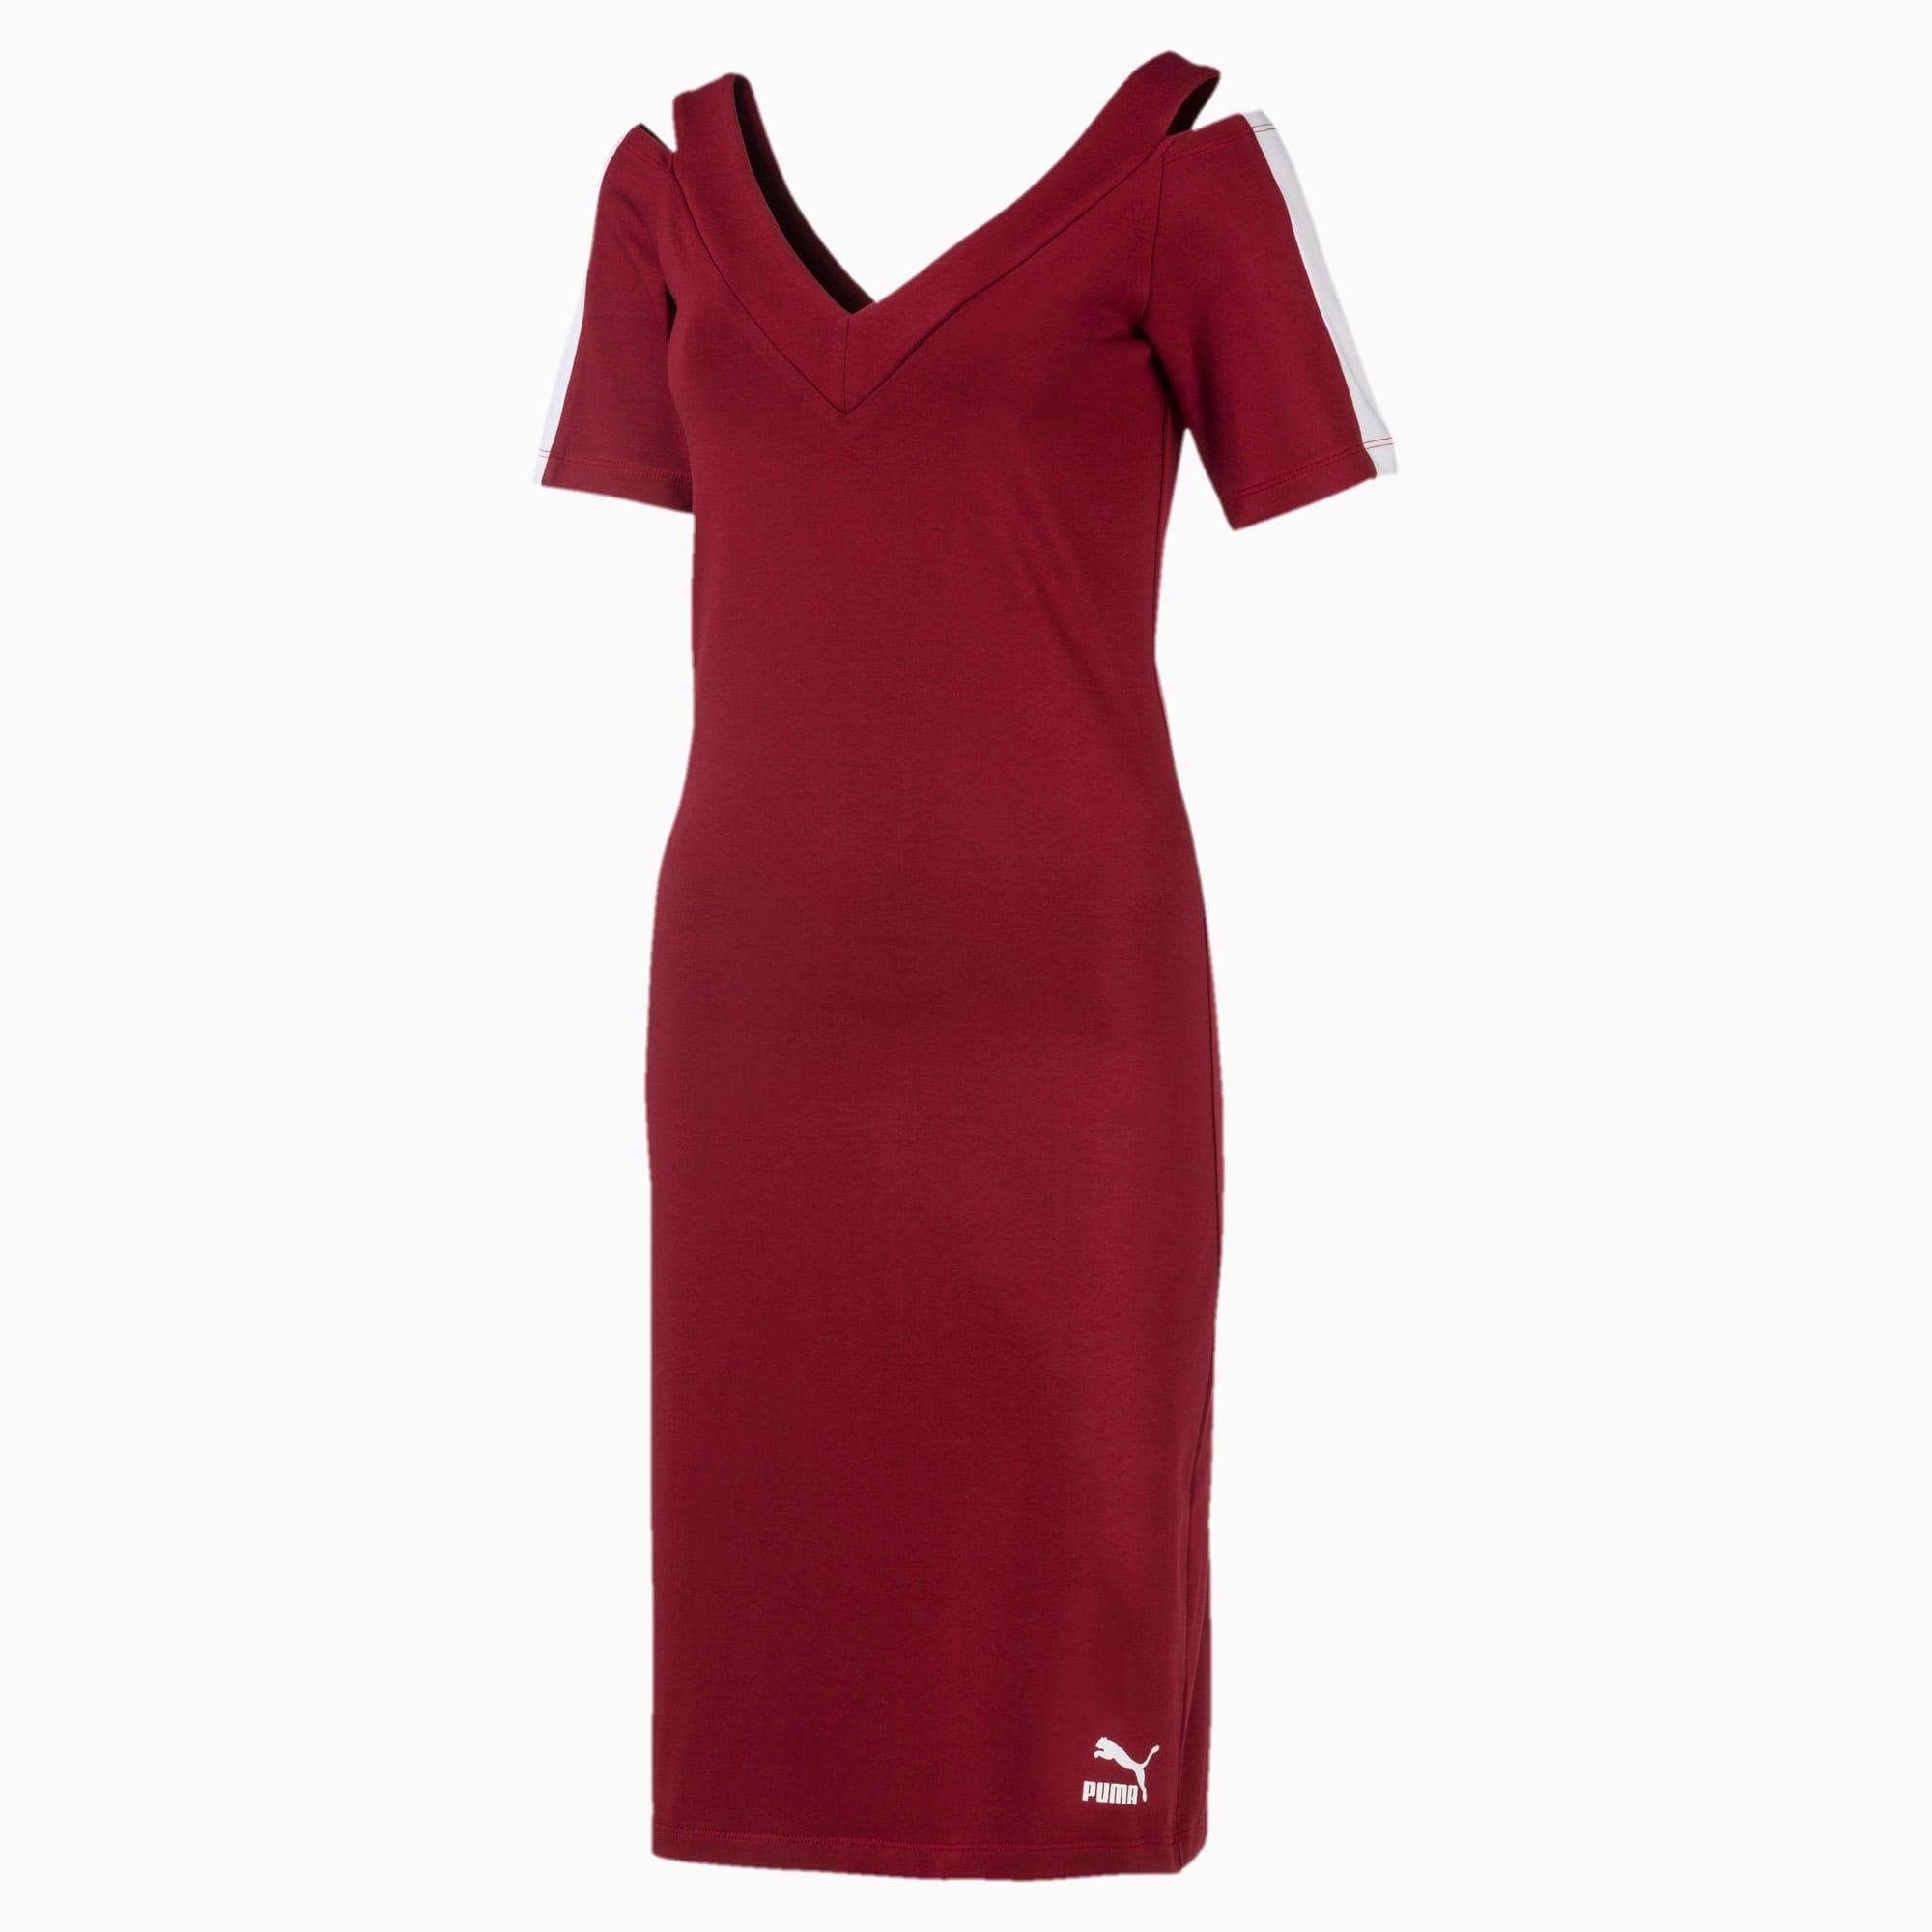 puma classic dress